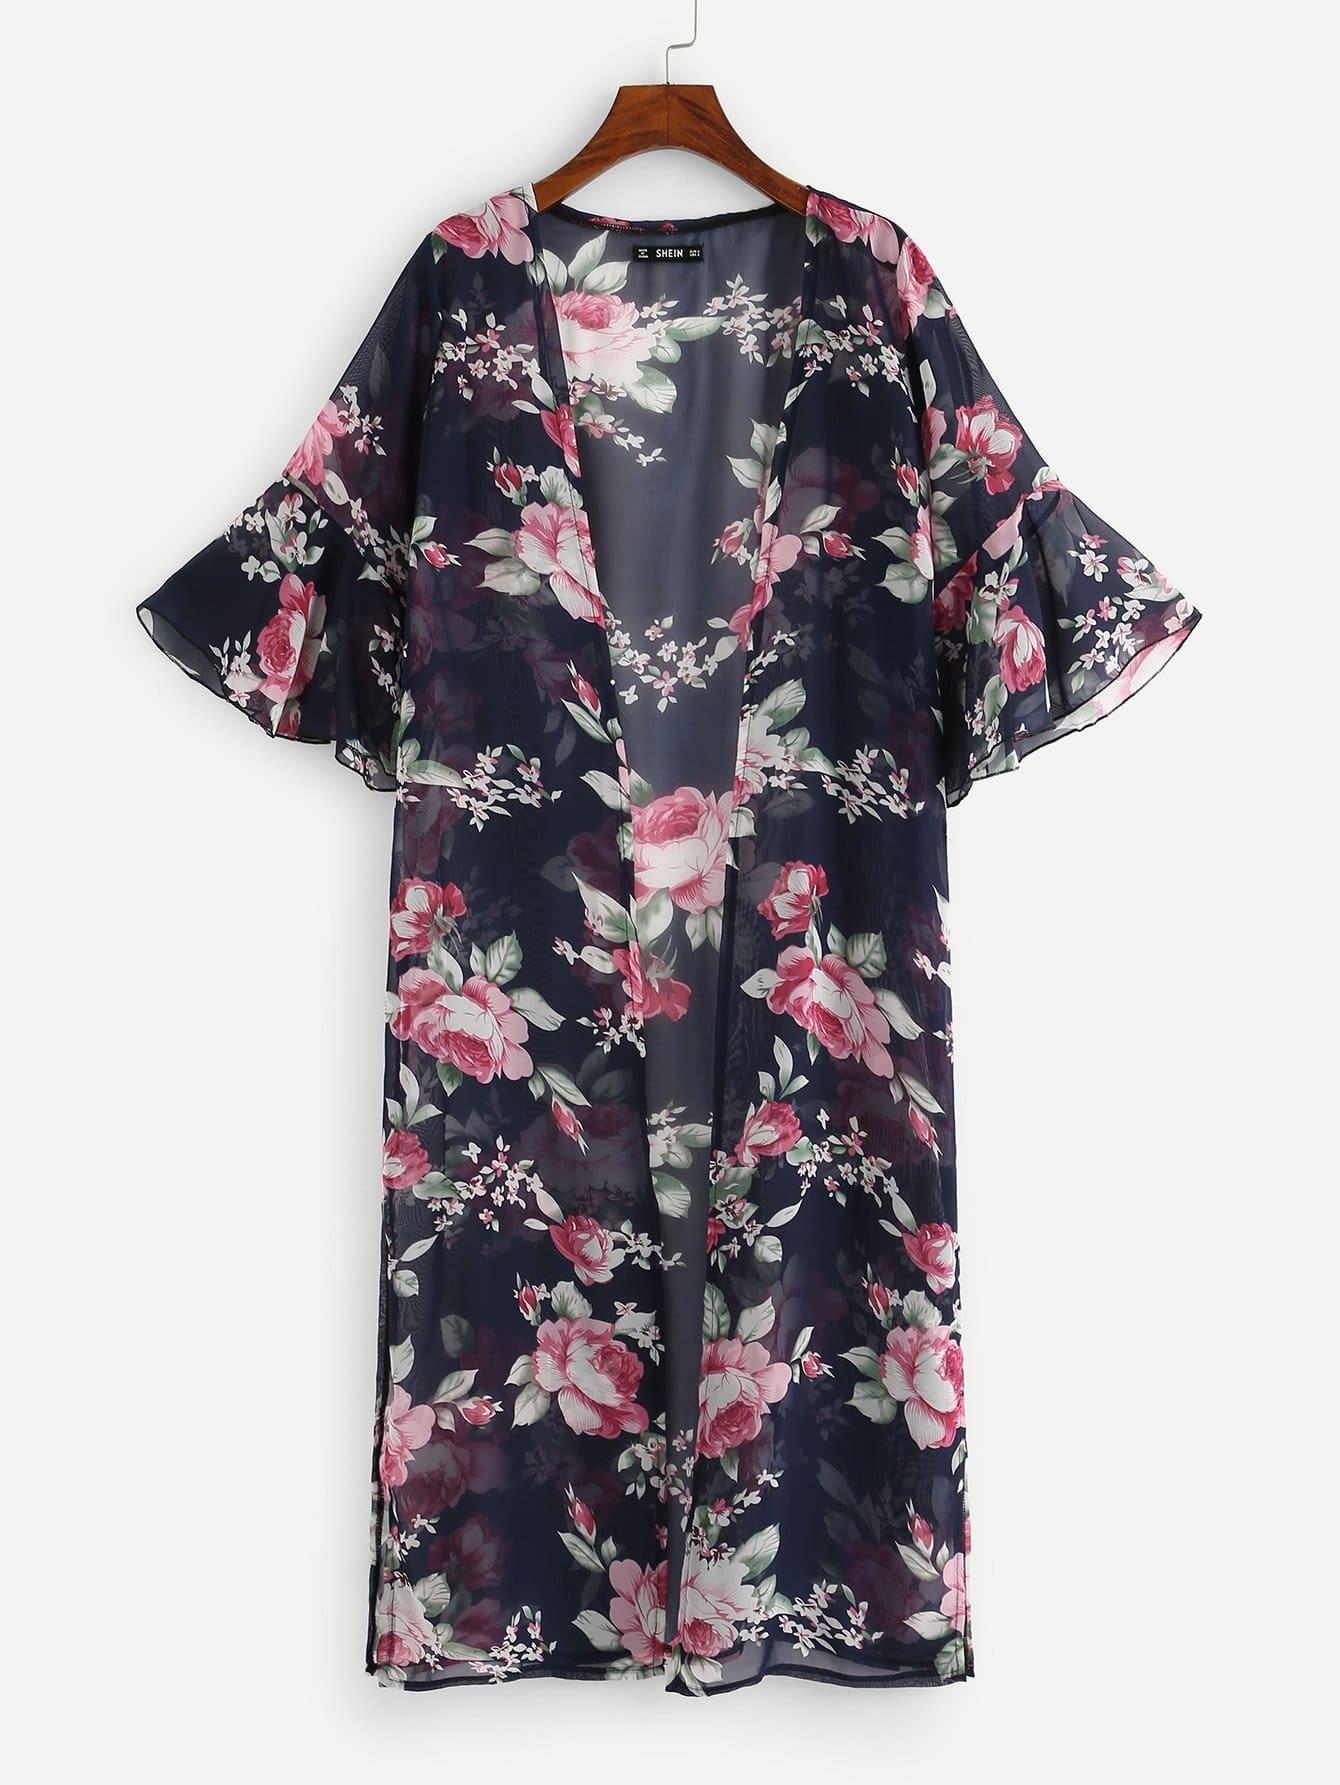 Купить Кимоно с коротким рукавом, null, SheIn